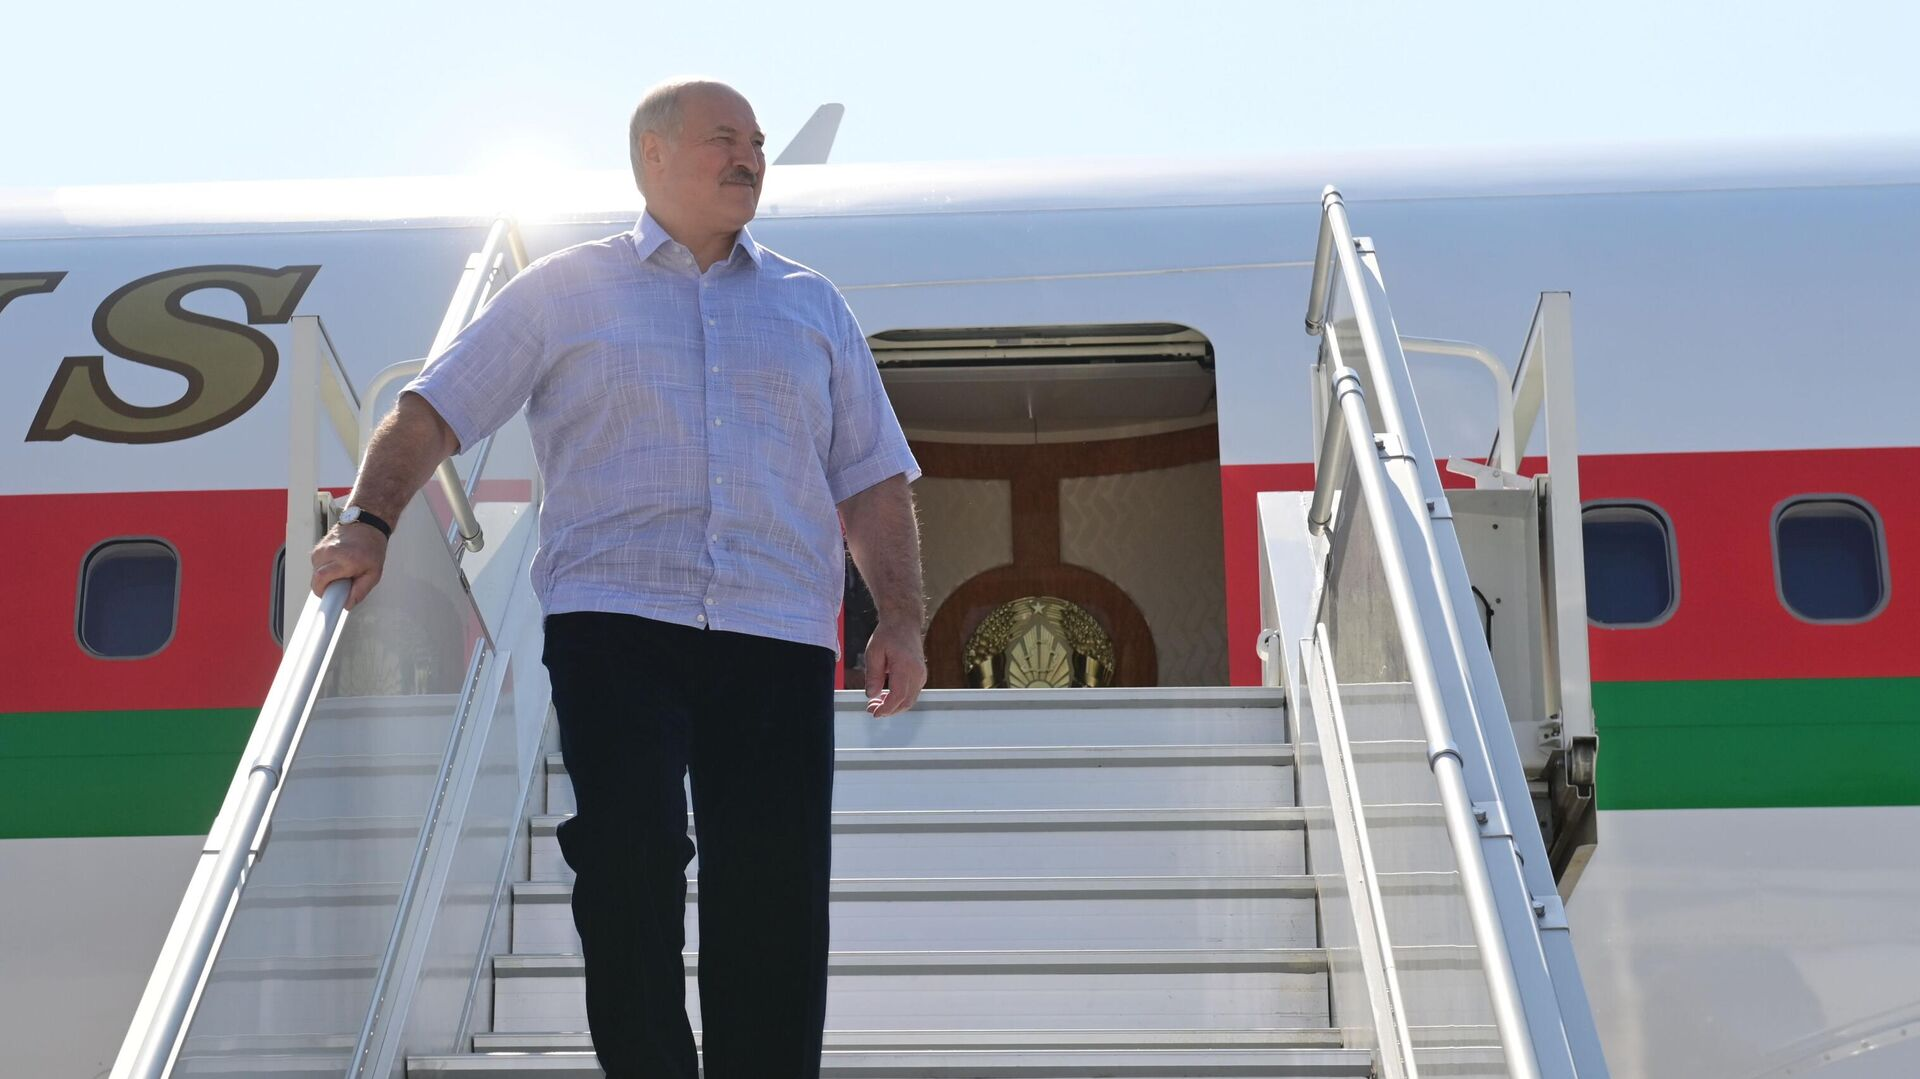 Президент Белоруссии Александр Лукашенко в аэропорту Сочи - РИА Новости, 1920, 15.09.2020